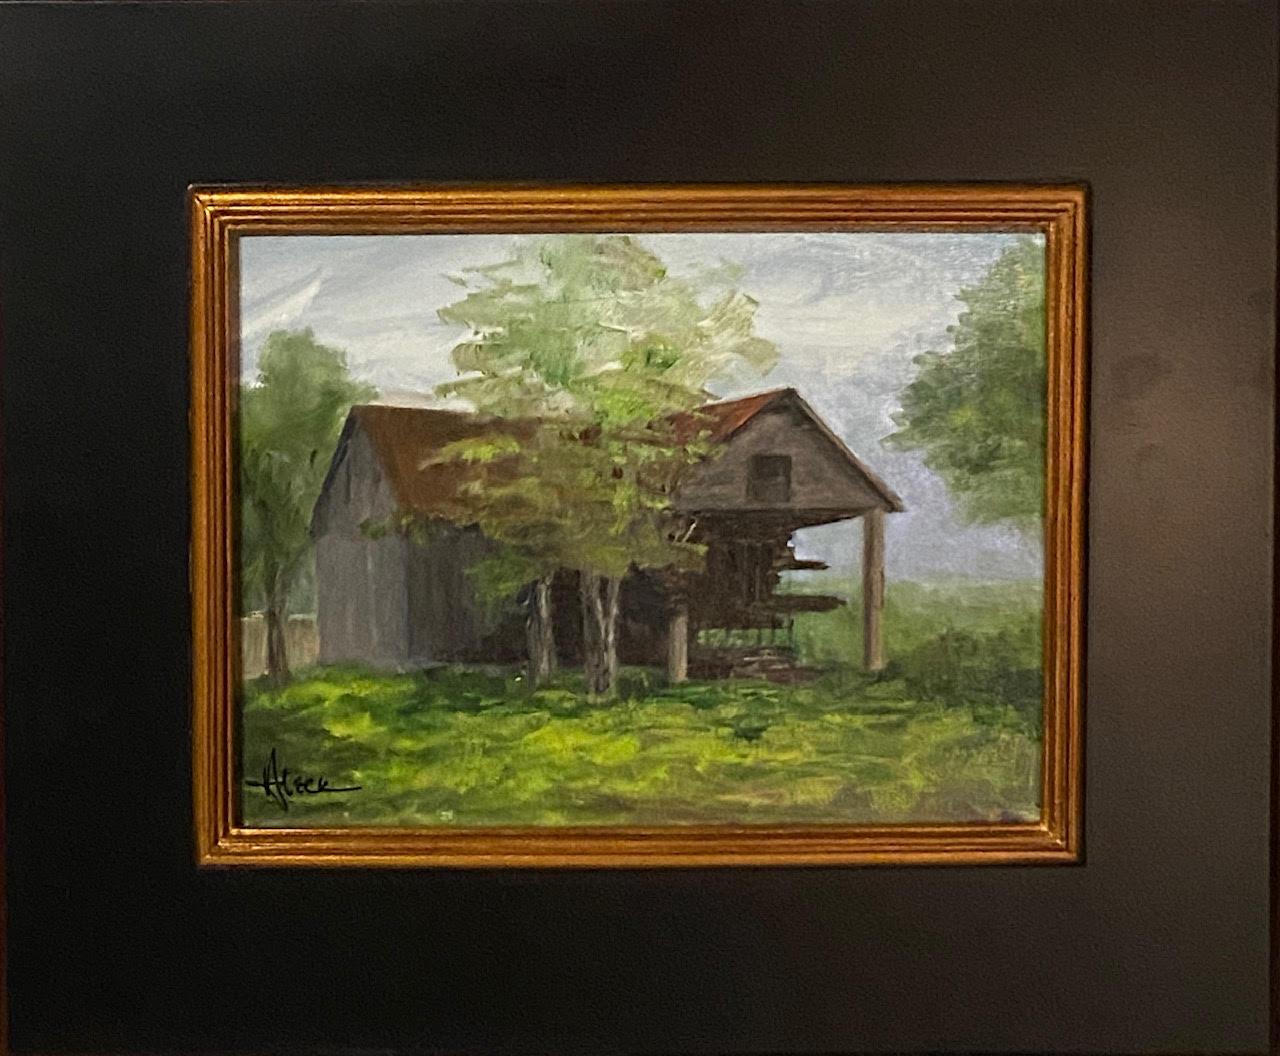 209 - Weathered Shed - 9x12 - Landscape - $250